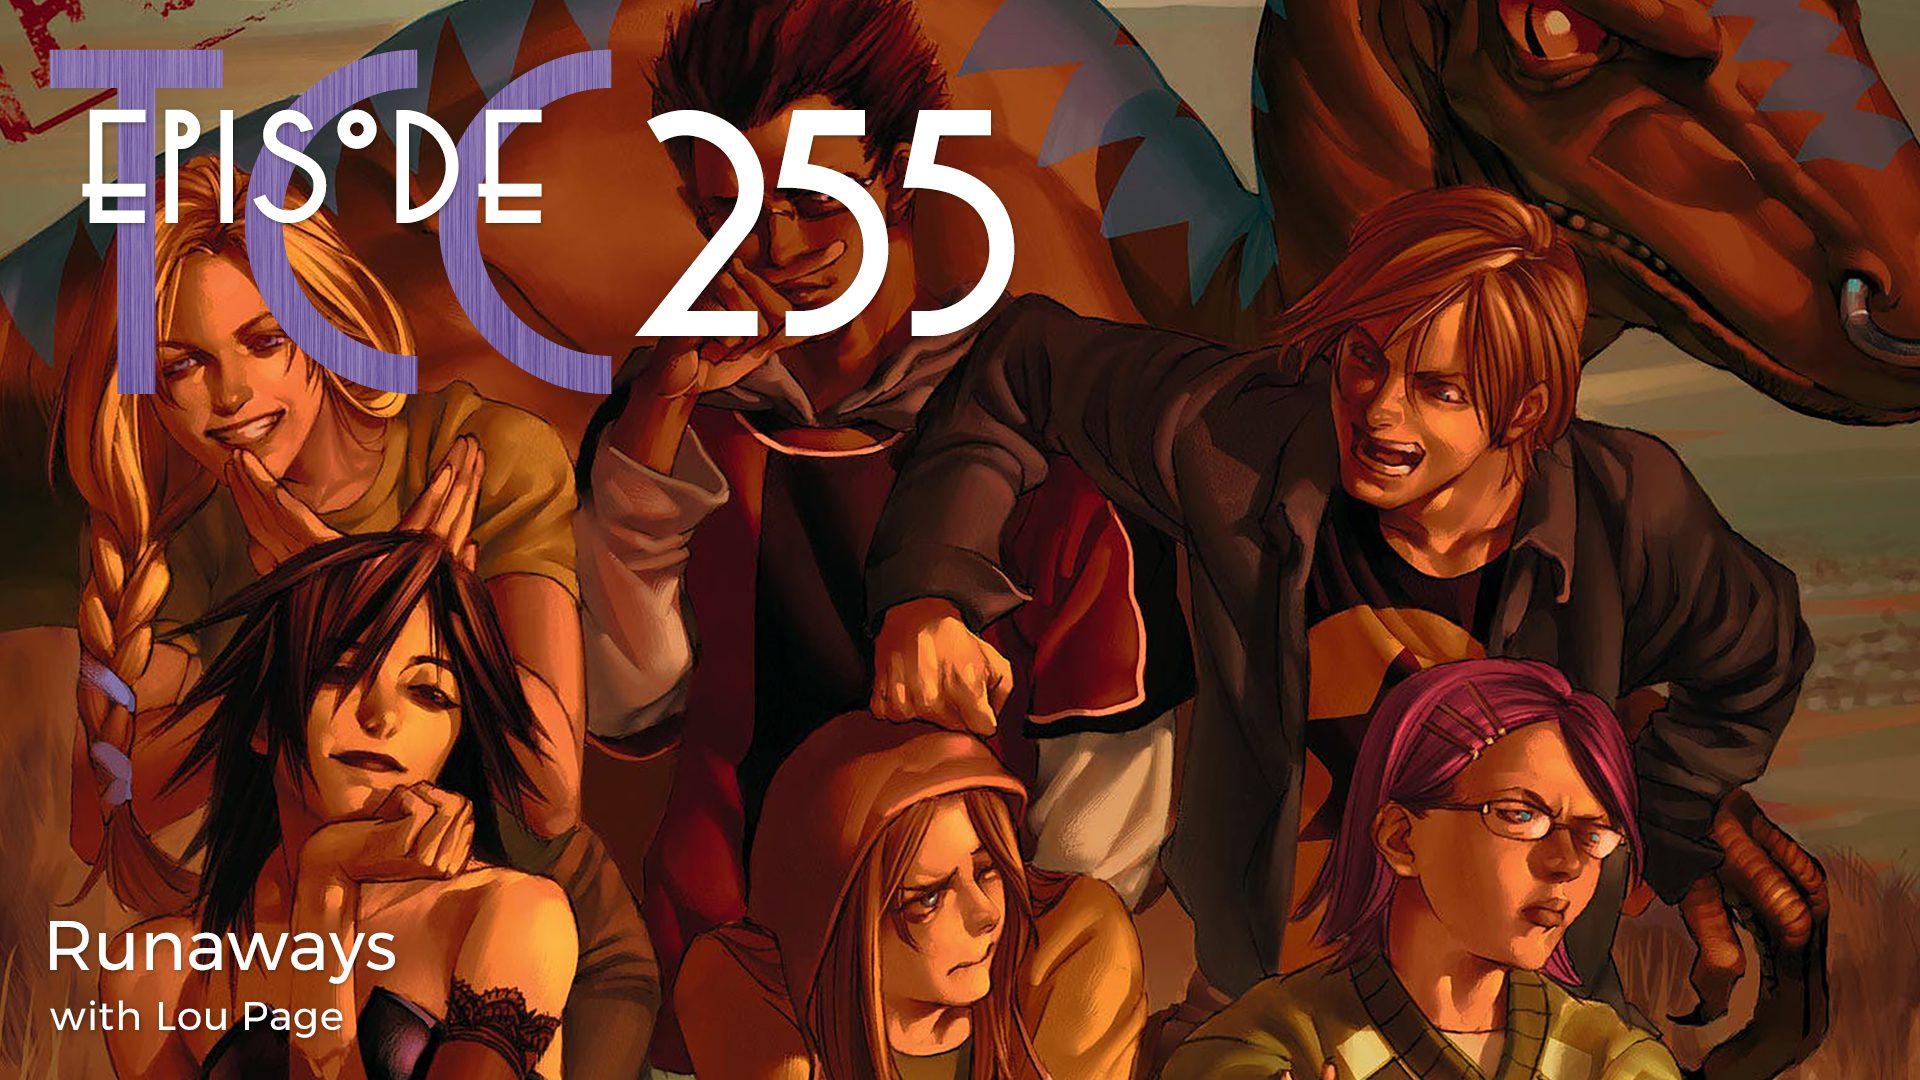 The Citadel Cafe 255: Runaways